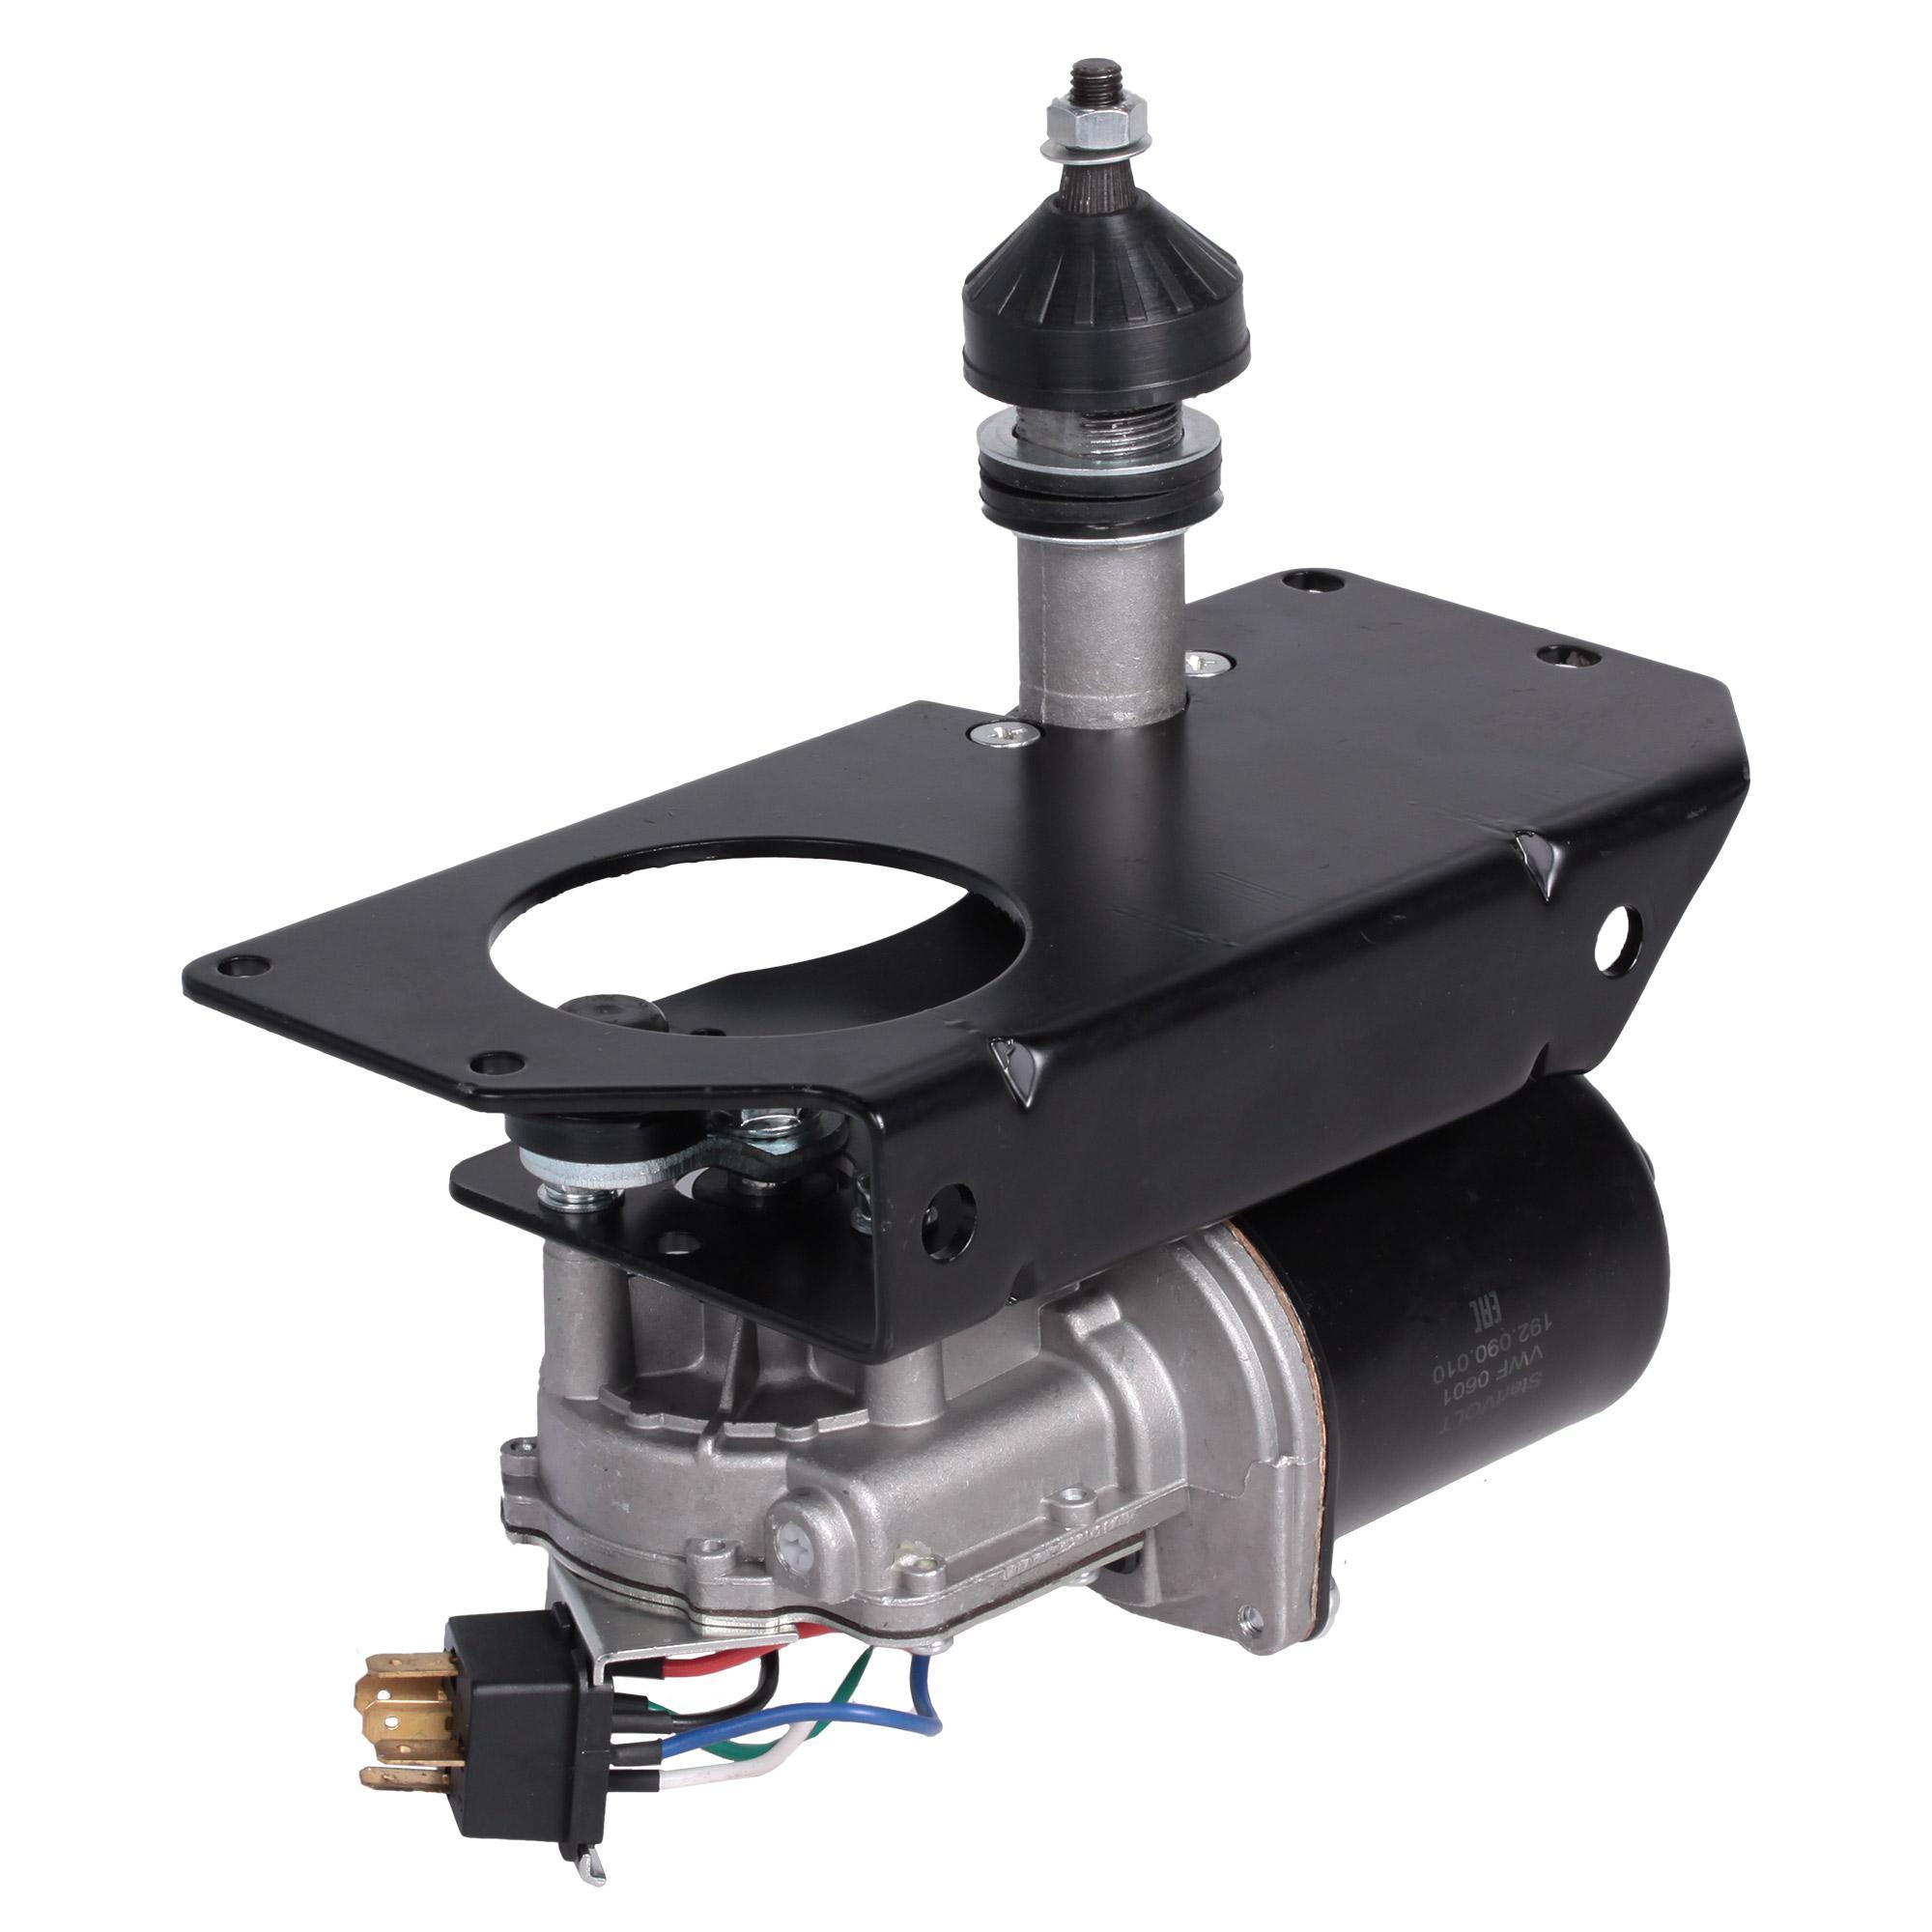 Моторедуктор стеклоочистителя для спецтехники МТЗ 82